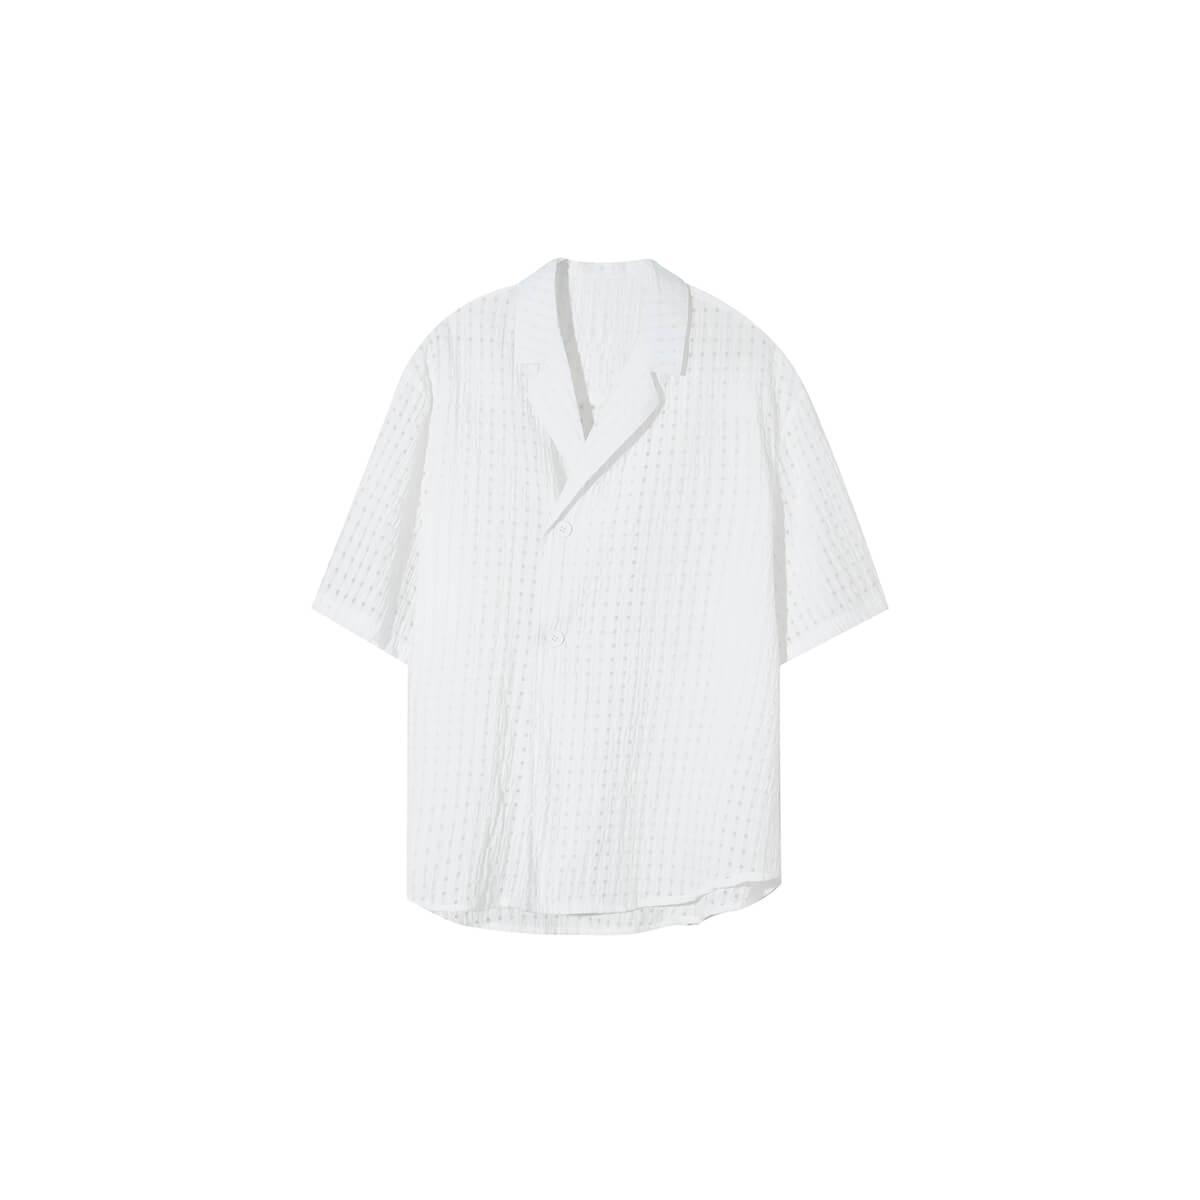 Рубашка Cui Layout Studio Lightweight Shirt Lattice Texture White